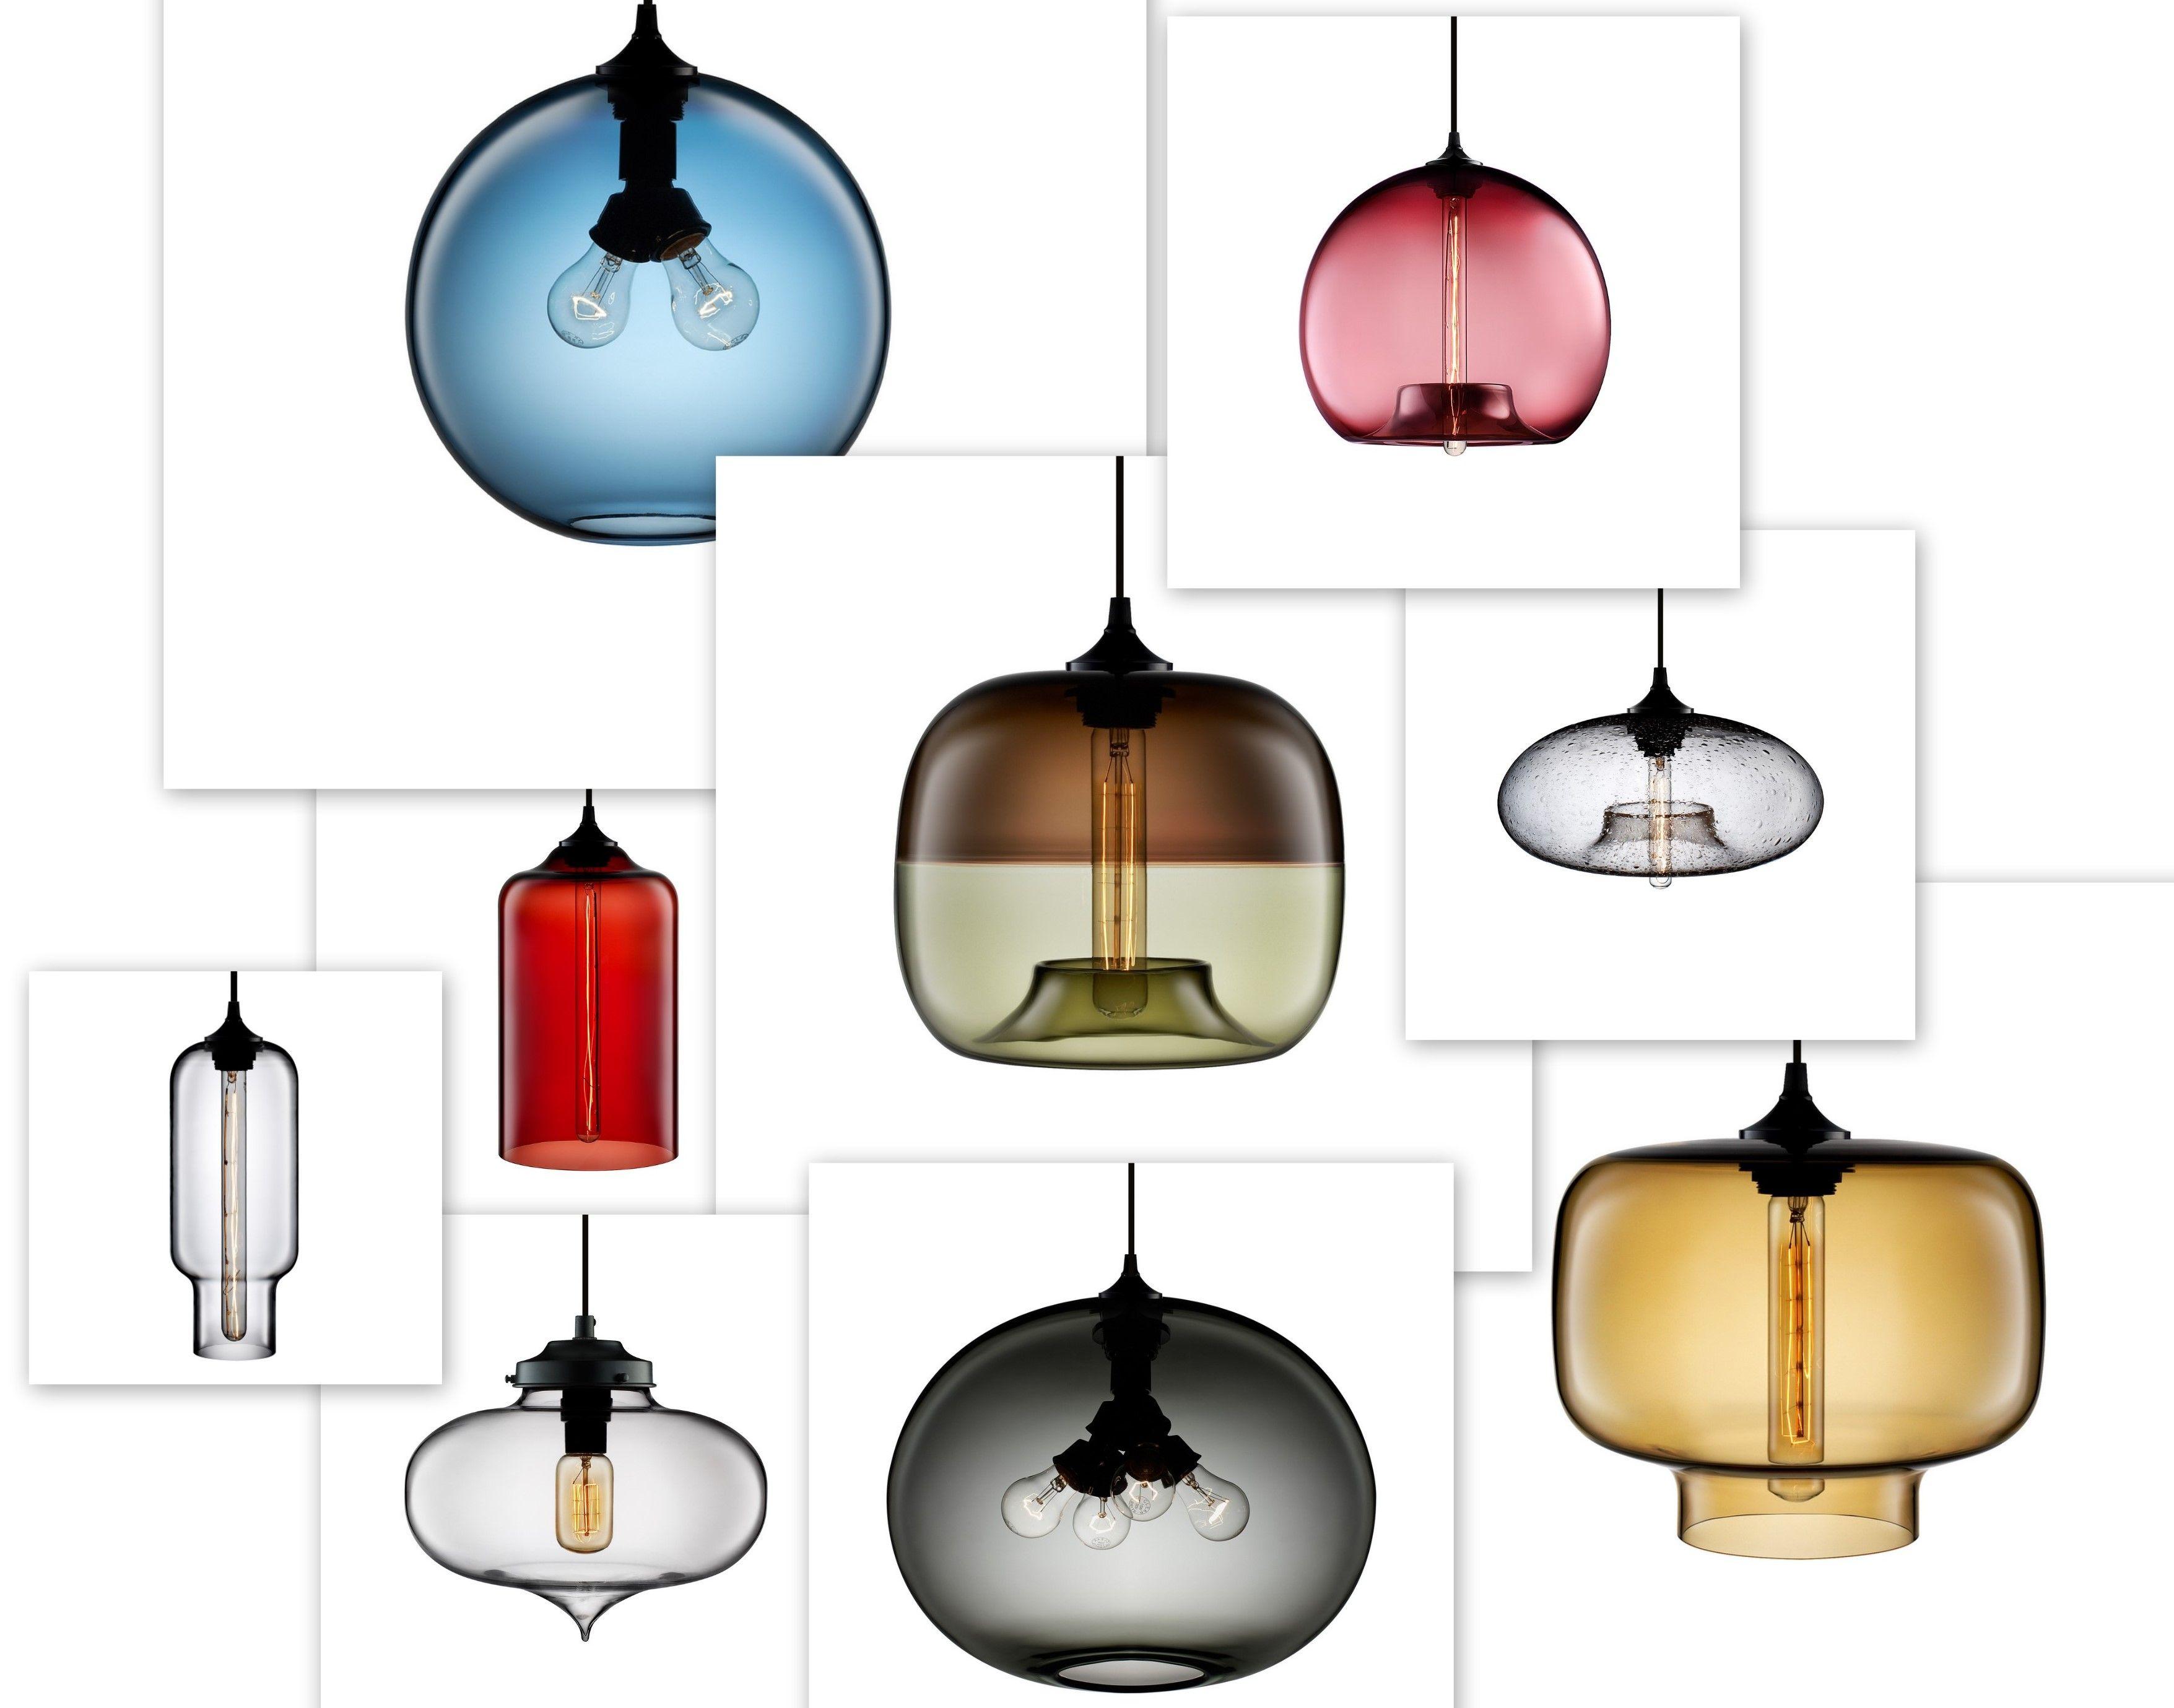 Glass pendant lights collage by niche modern they have a selection glass pendant lights collage by niche modern they have a selection at prices aloadofball Gallery